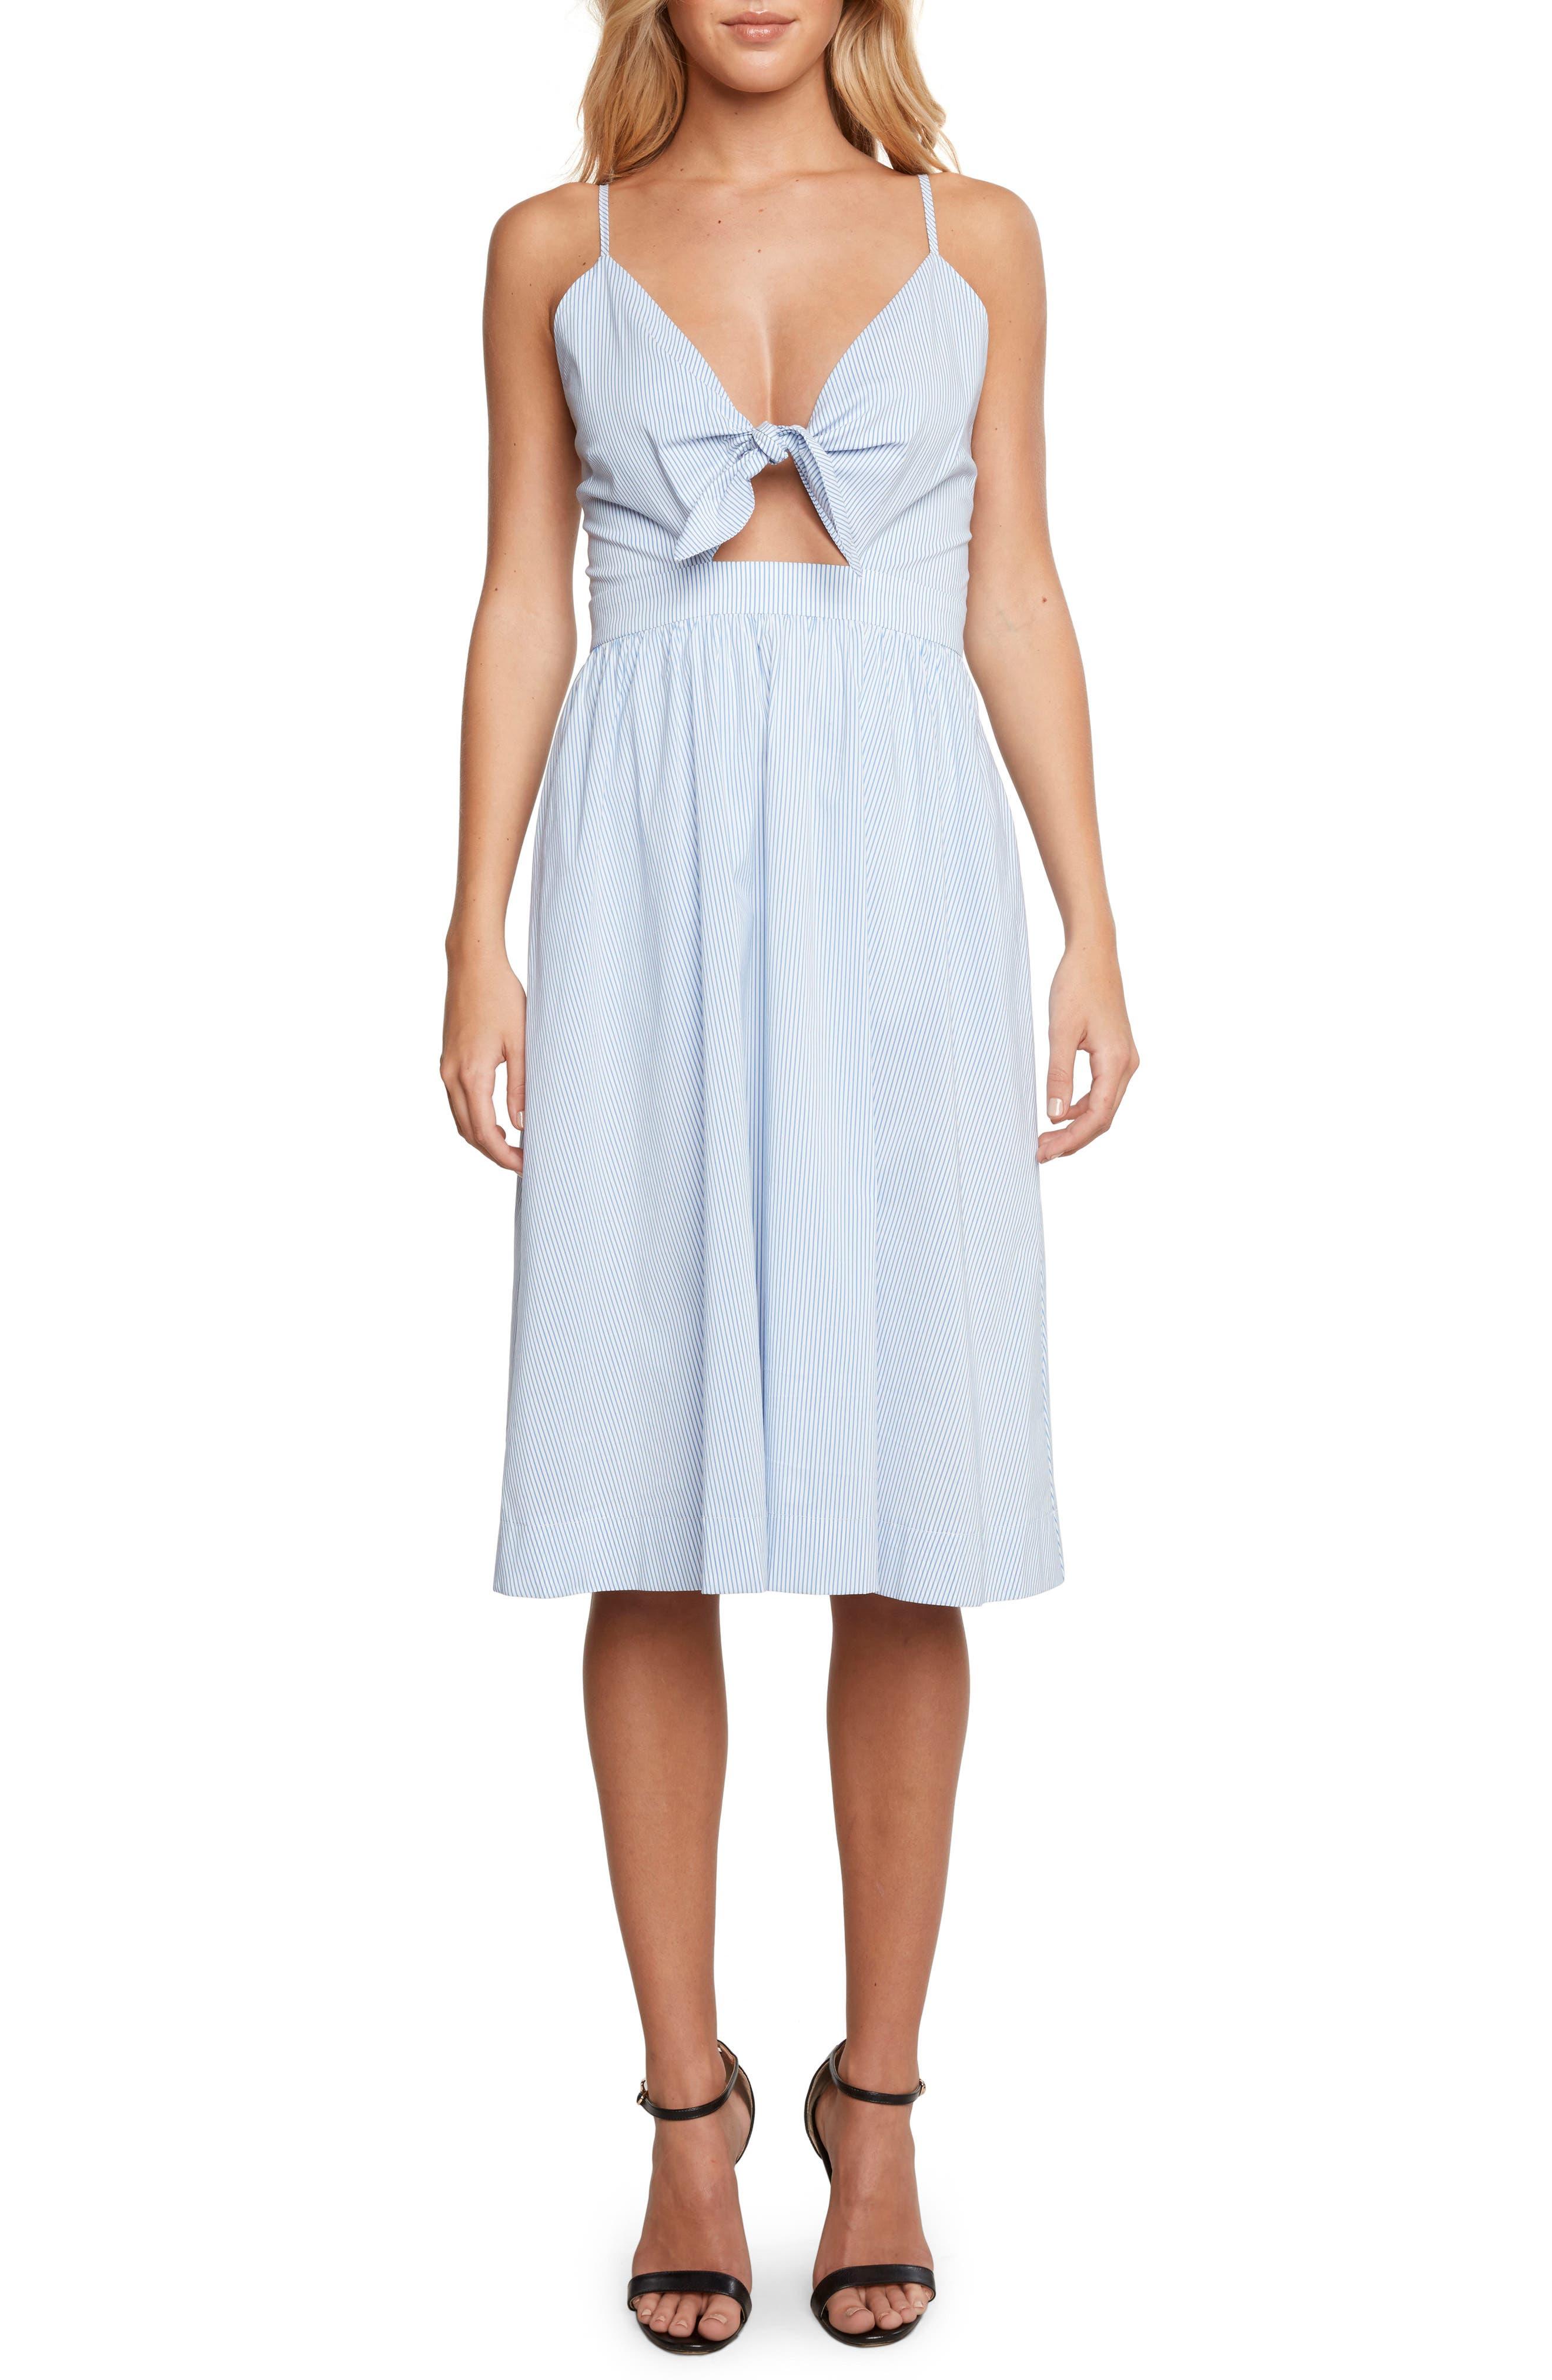 Brenda Tie Front Dress,                             Main thumbnail 1, color,                             Chambray